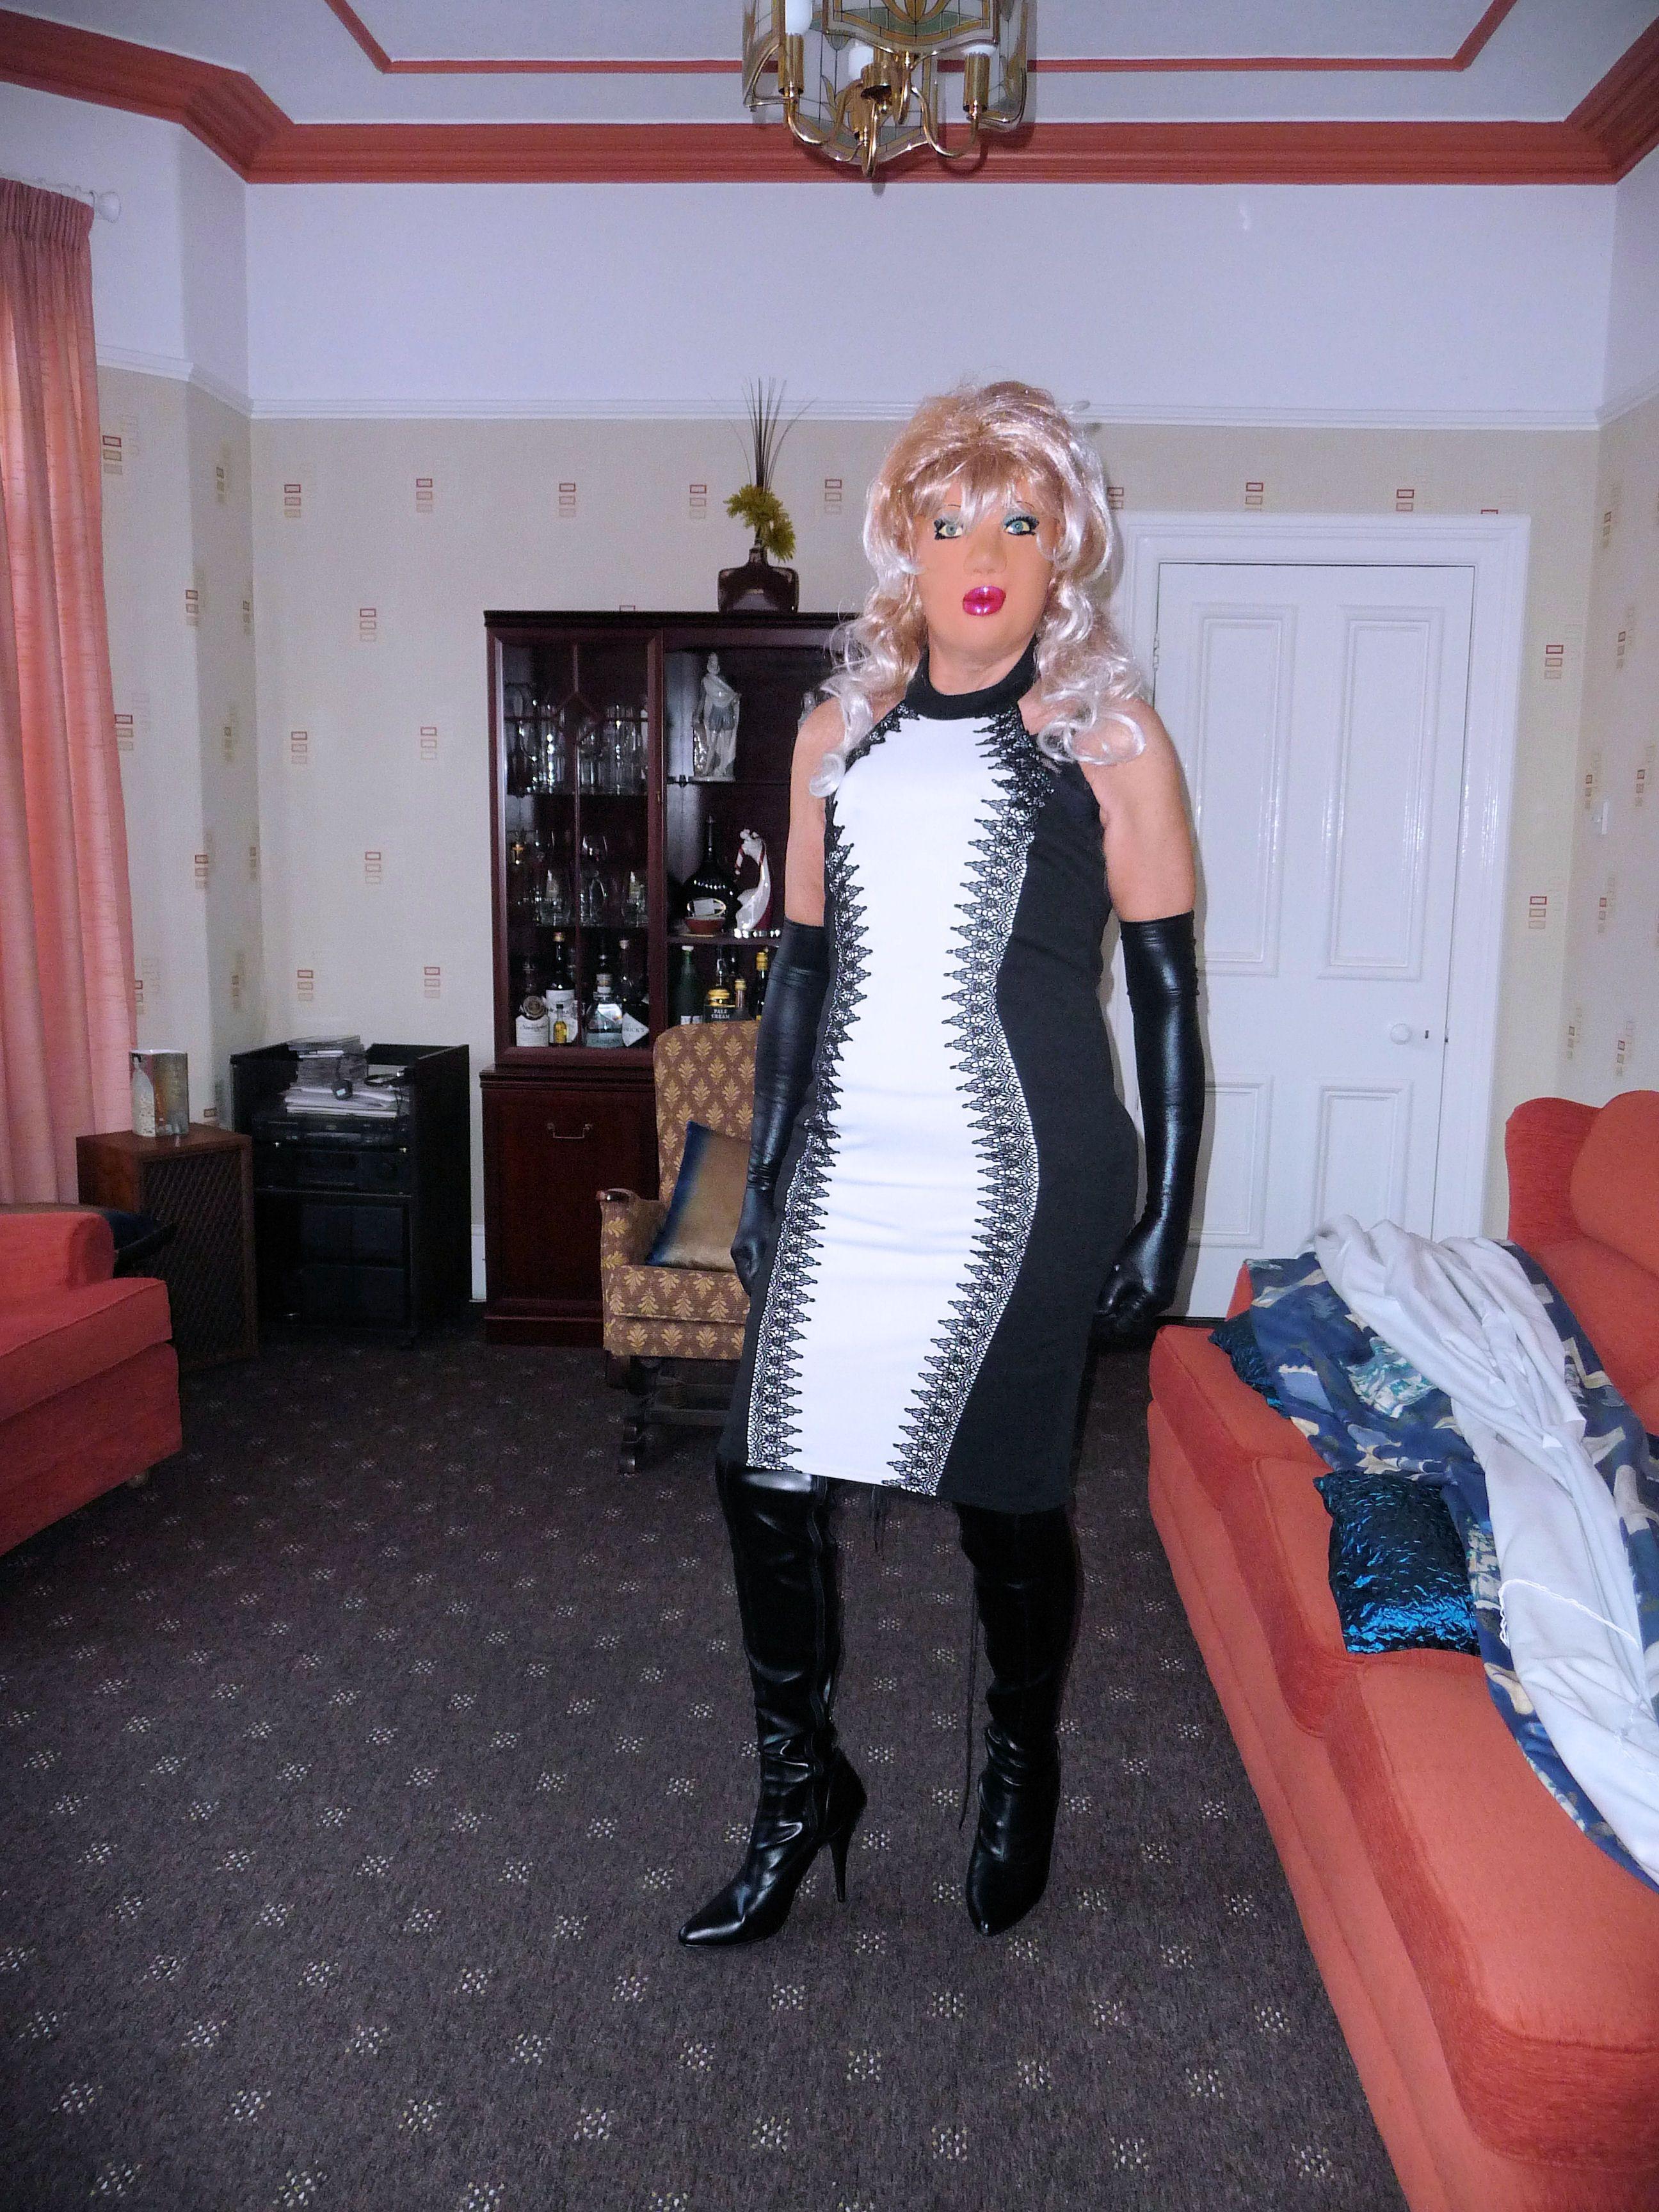 Transvestite wearing thigh boots